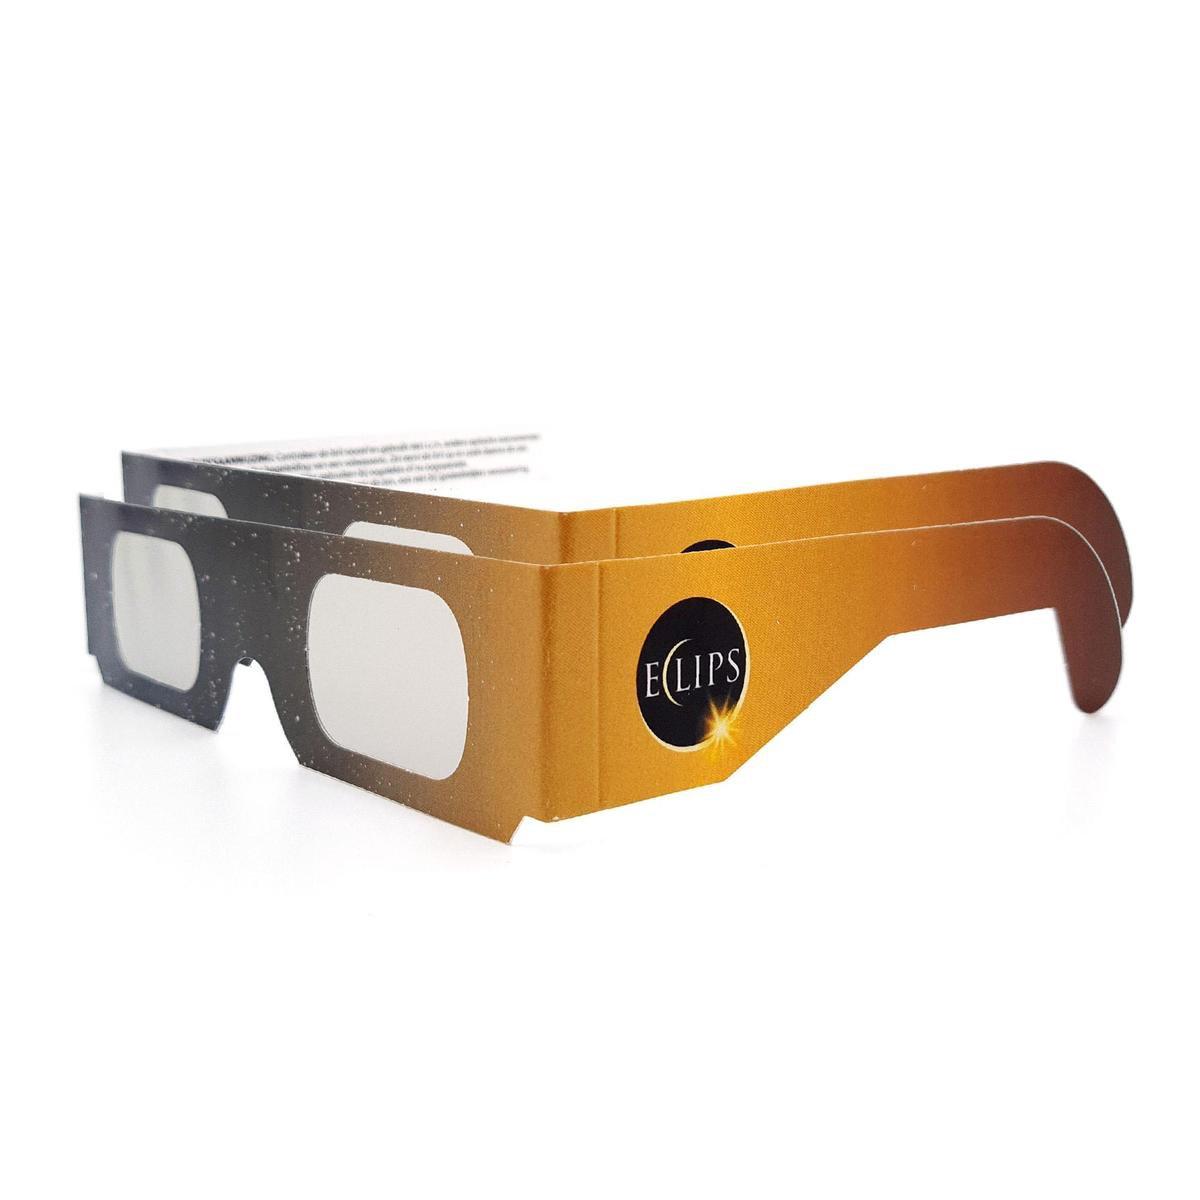 Eclipsbril - 2 stuks